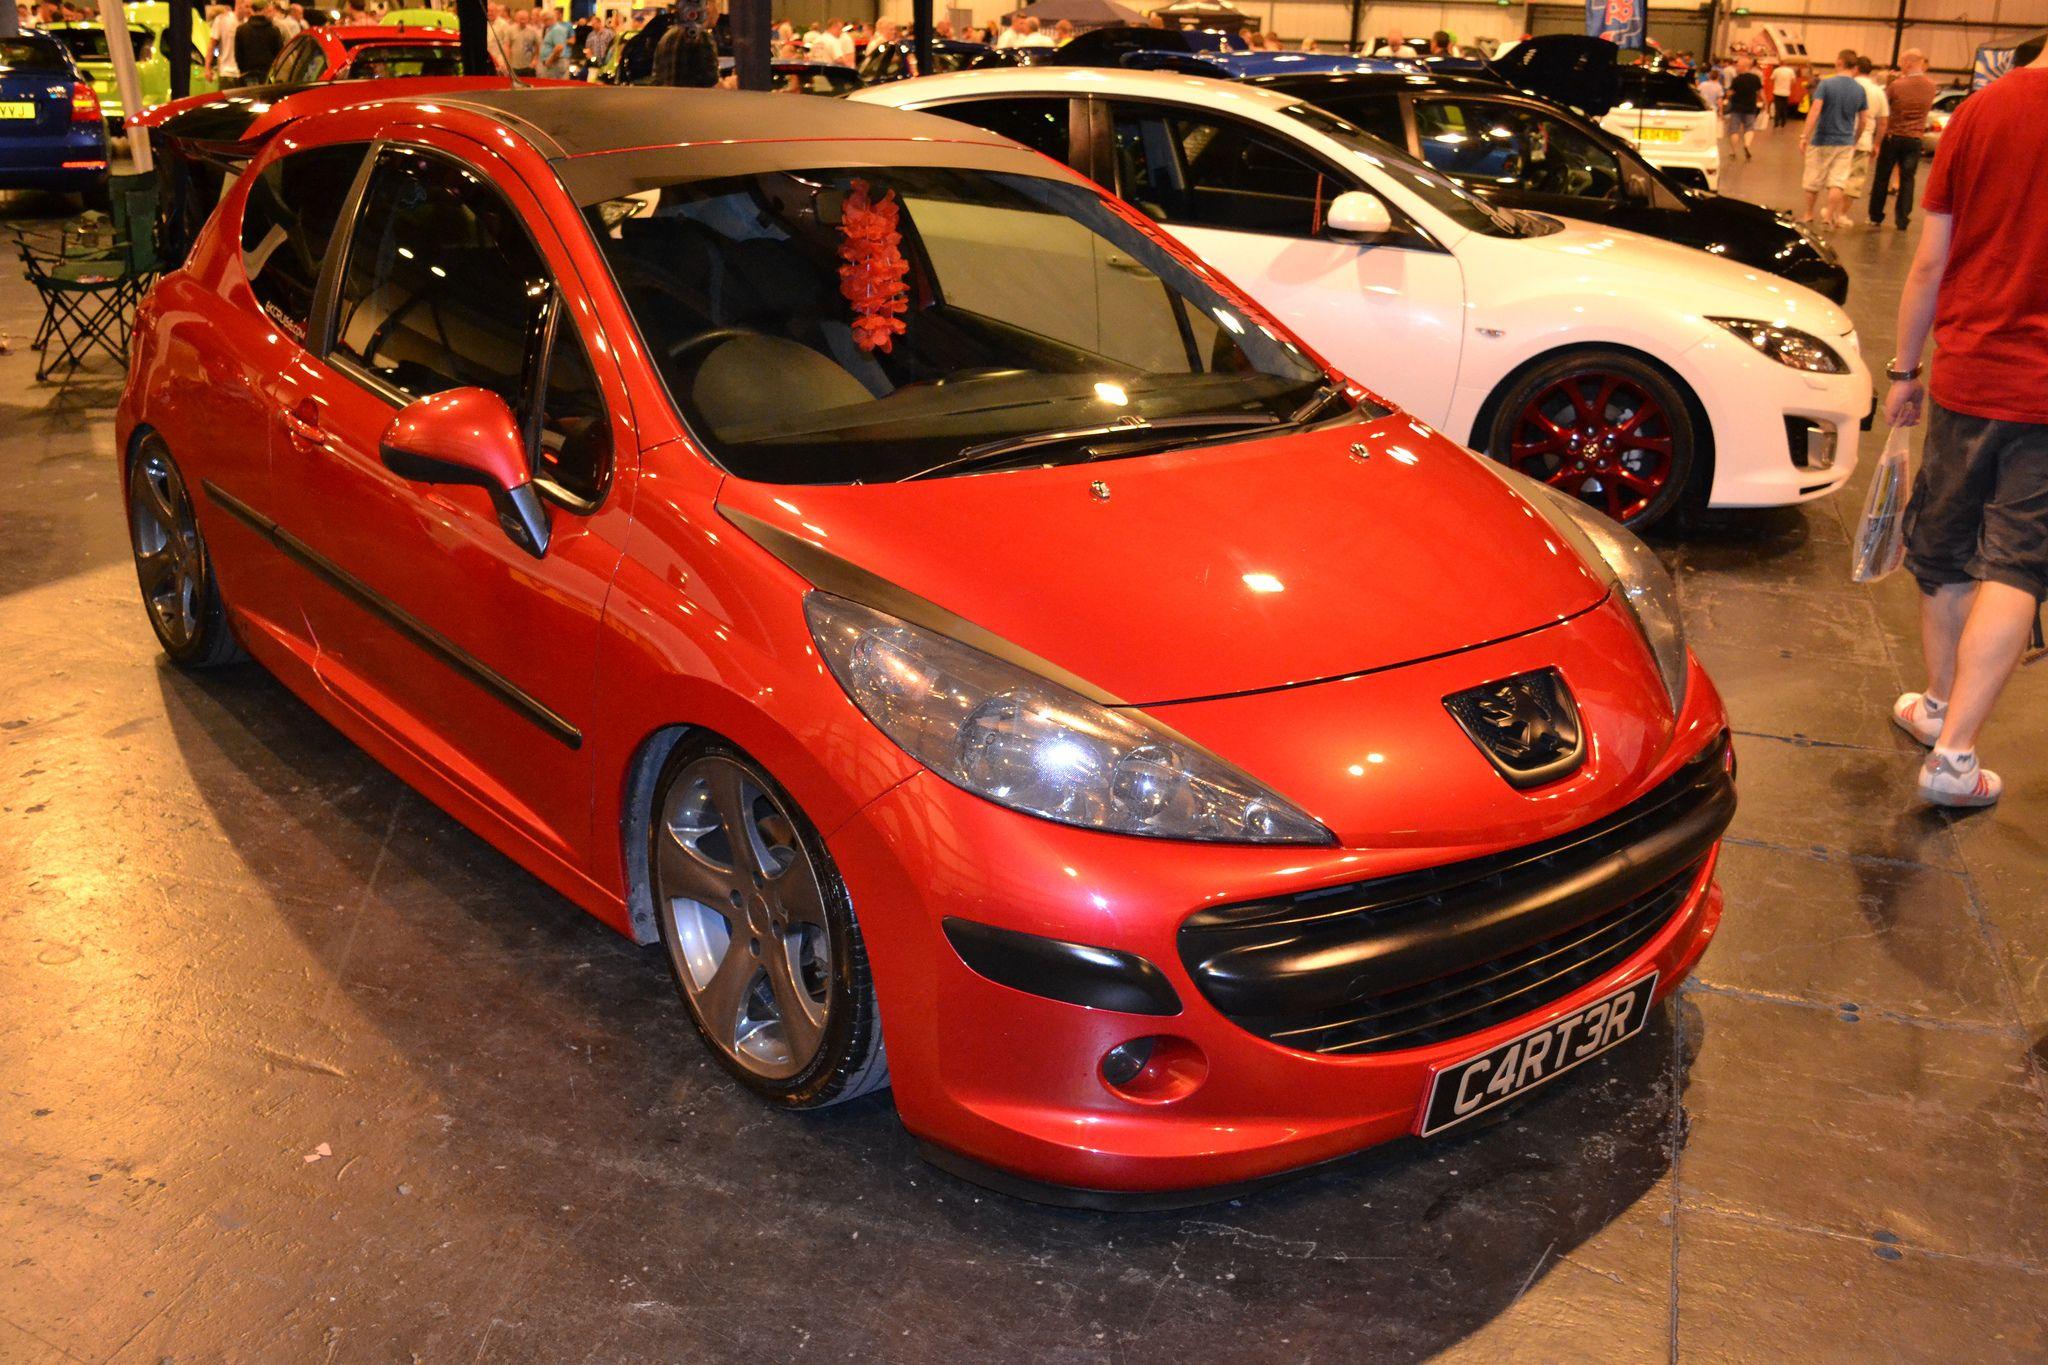 Peugeot 207 Tuning 4 Tuning Peugeot Bmw Vehicles